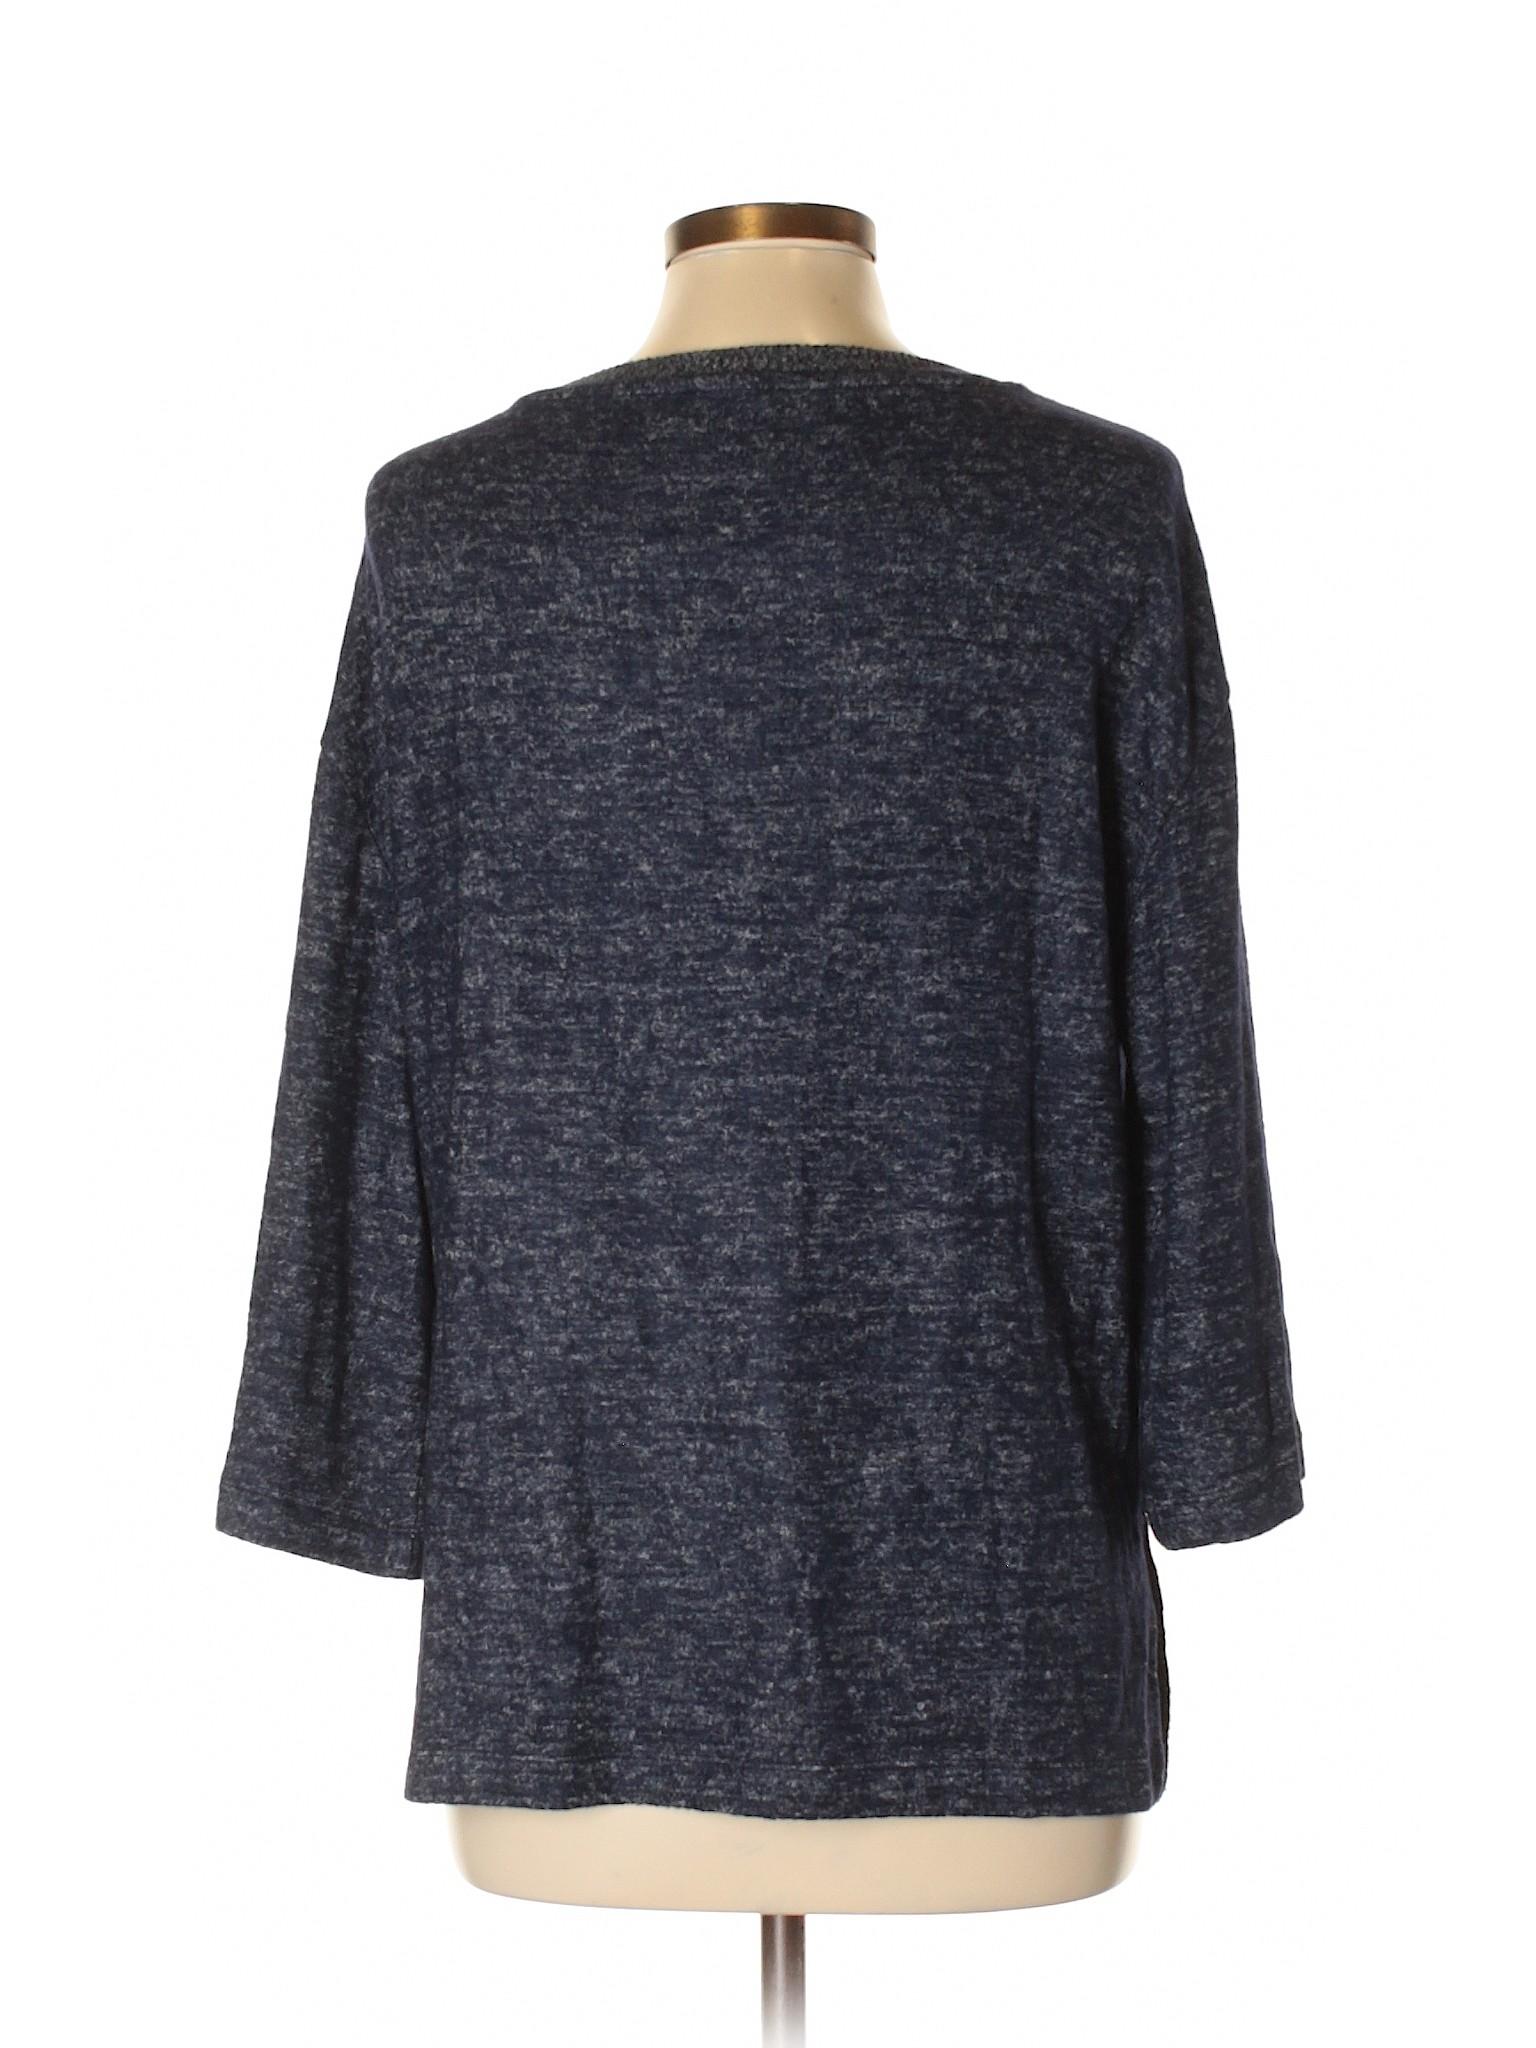 Boutique Boutique Gap Pullover Gap Sweater Pullover Boutique Sweater Pullover Gap ZwnfAfgqx